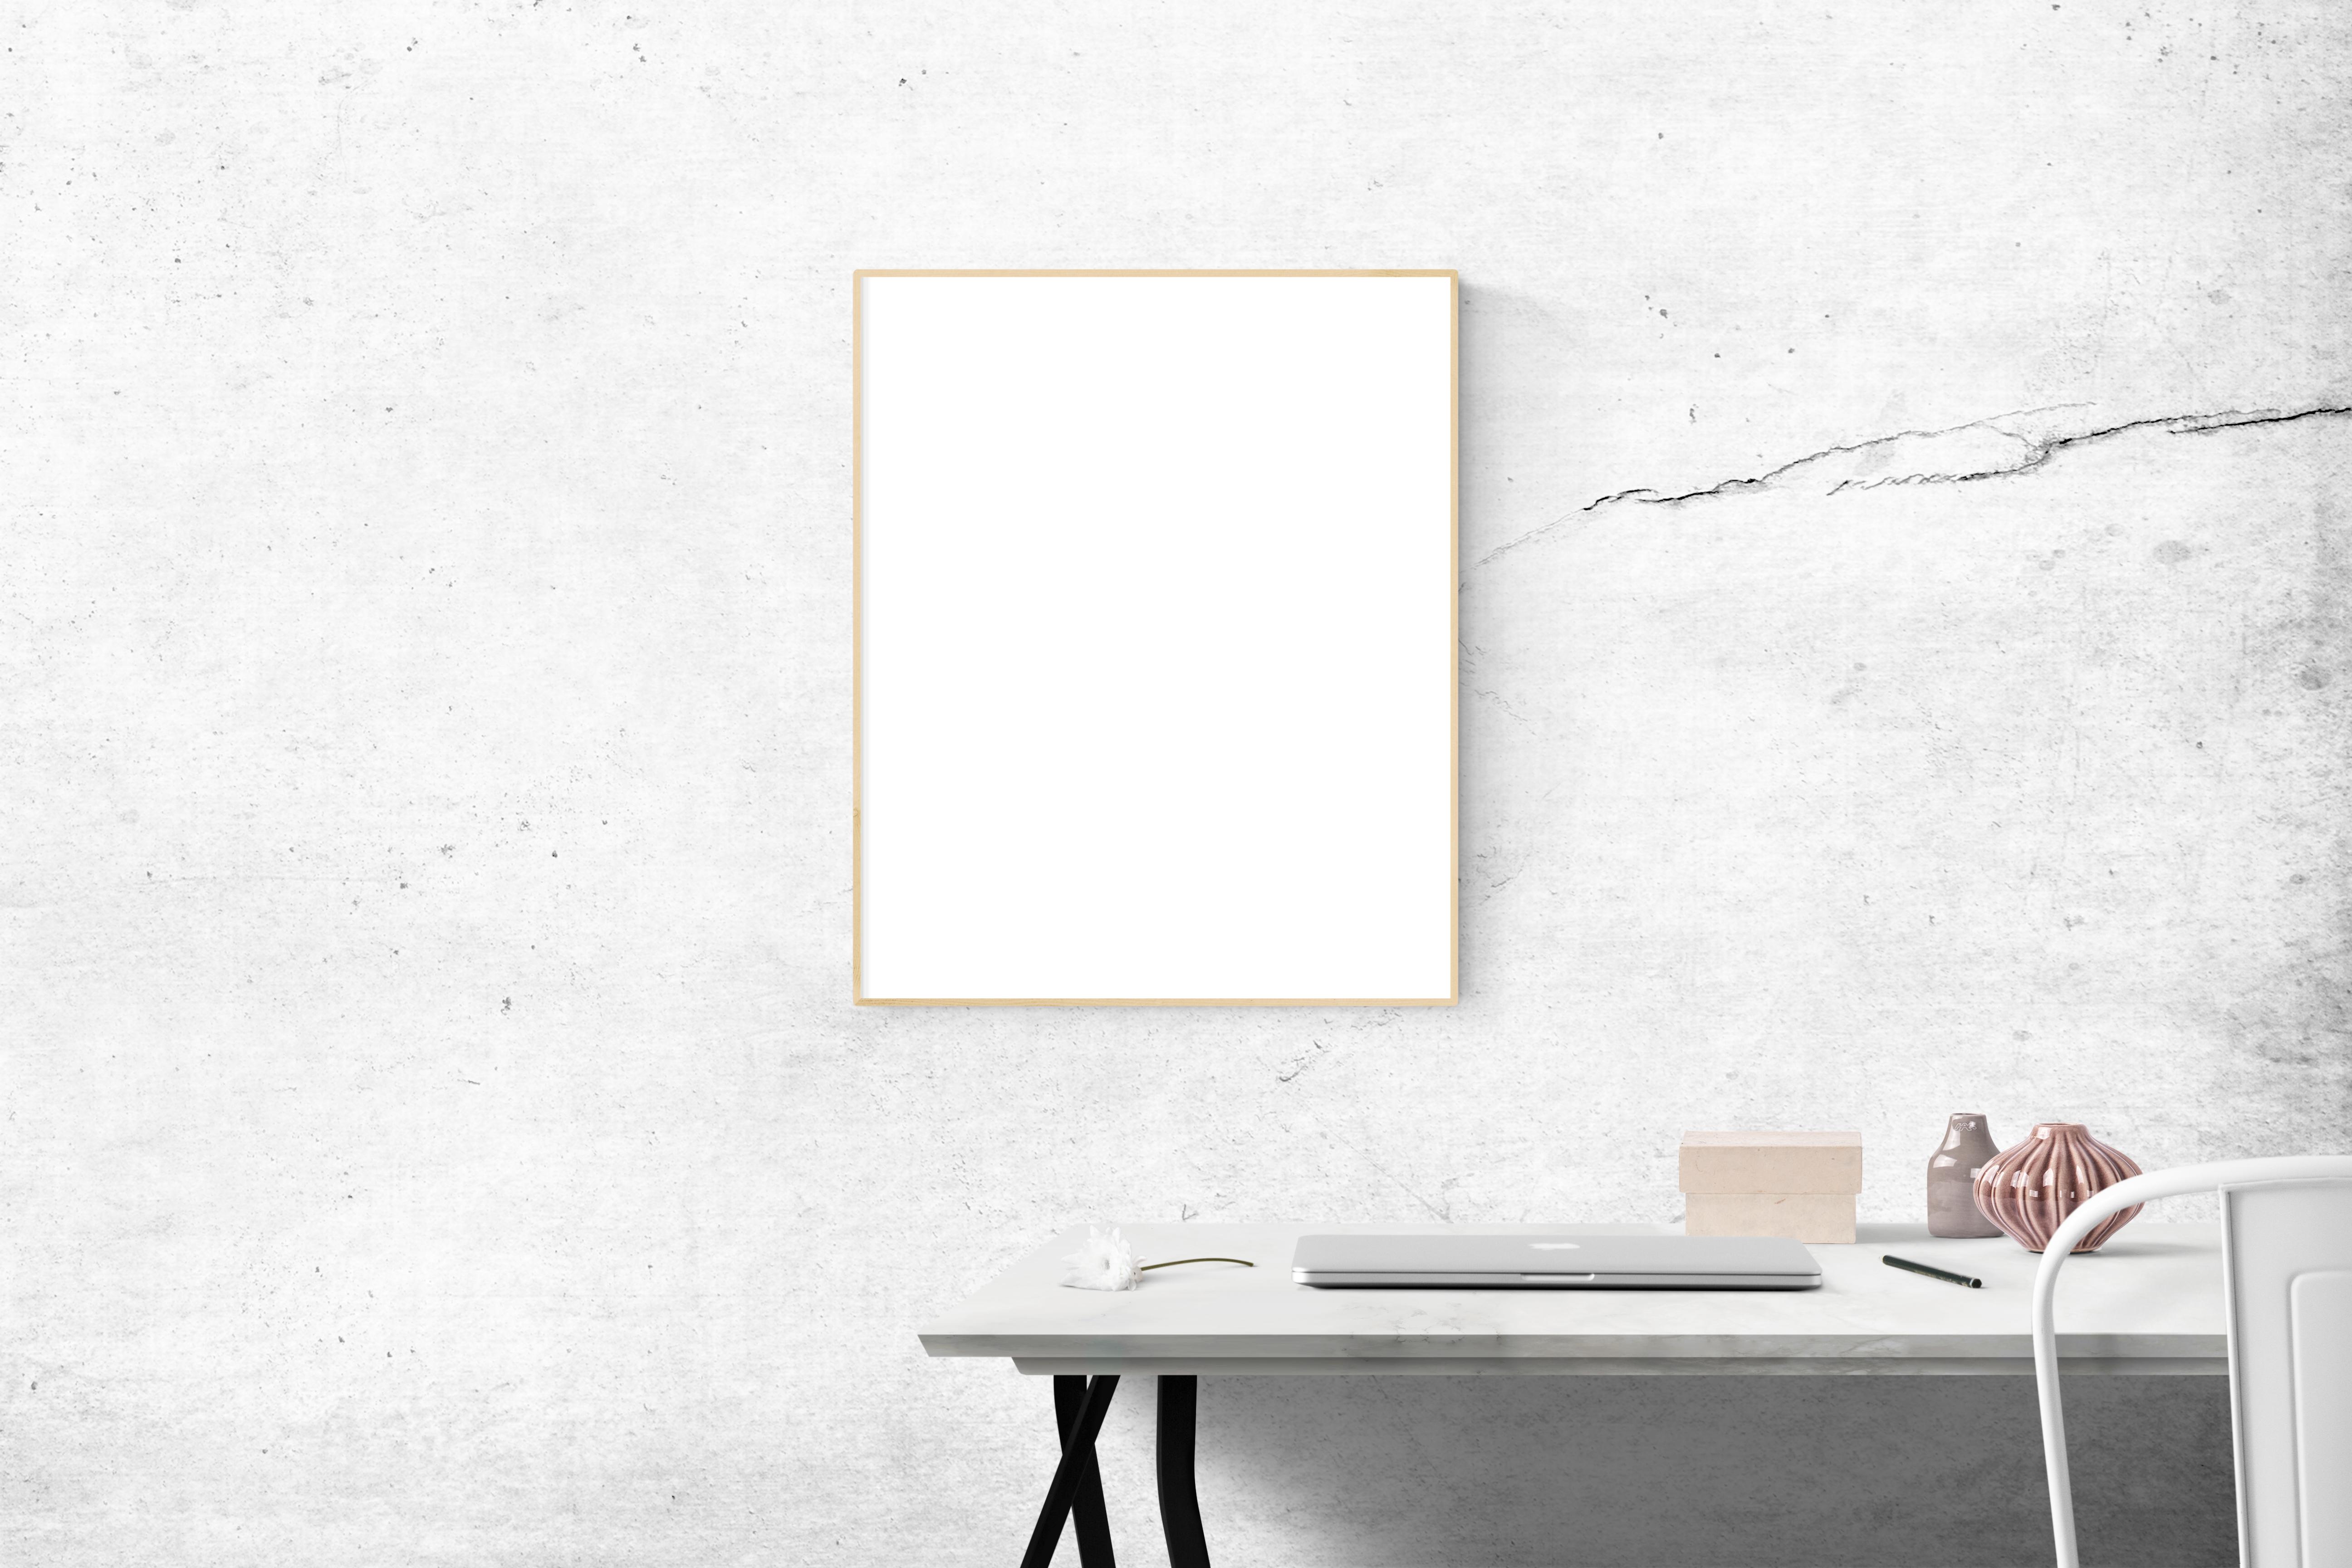 Blank Frame Above Table, Interior design, Vintage, Vase, Table, HQ Photo